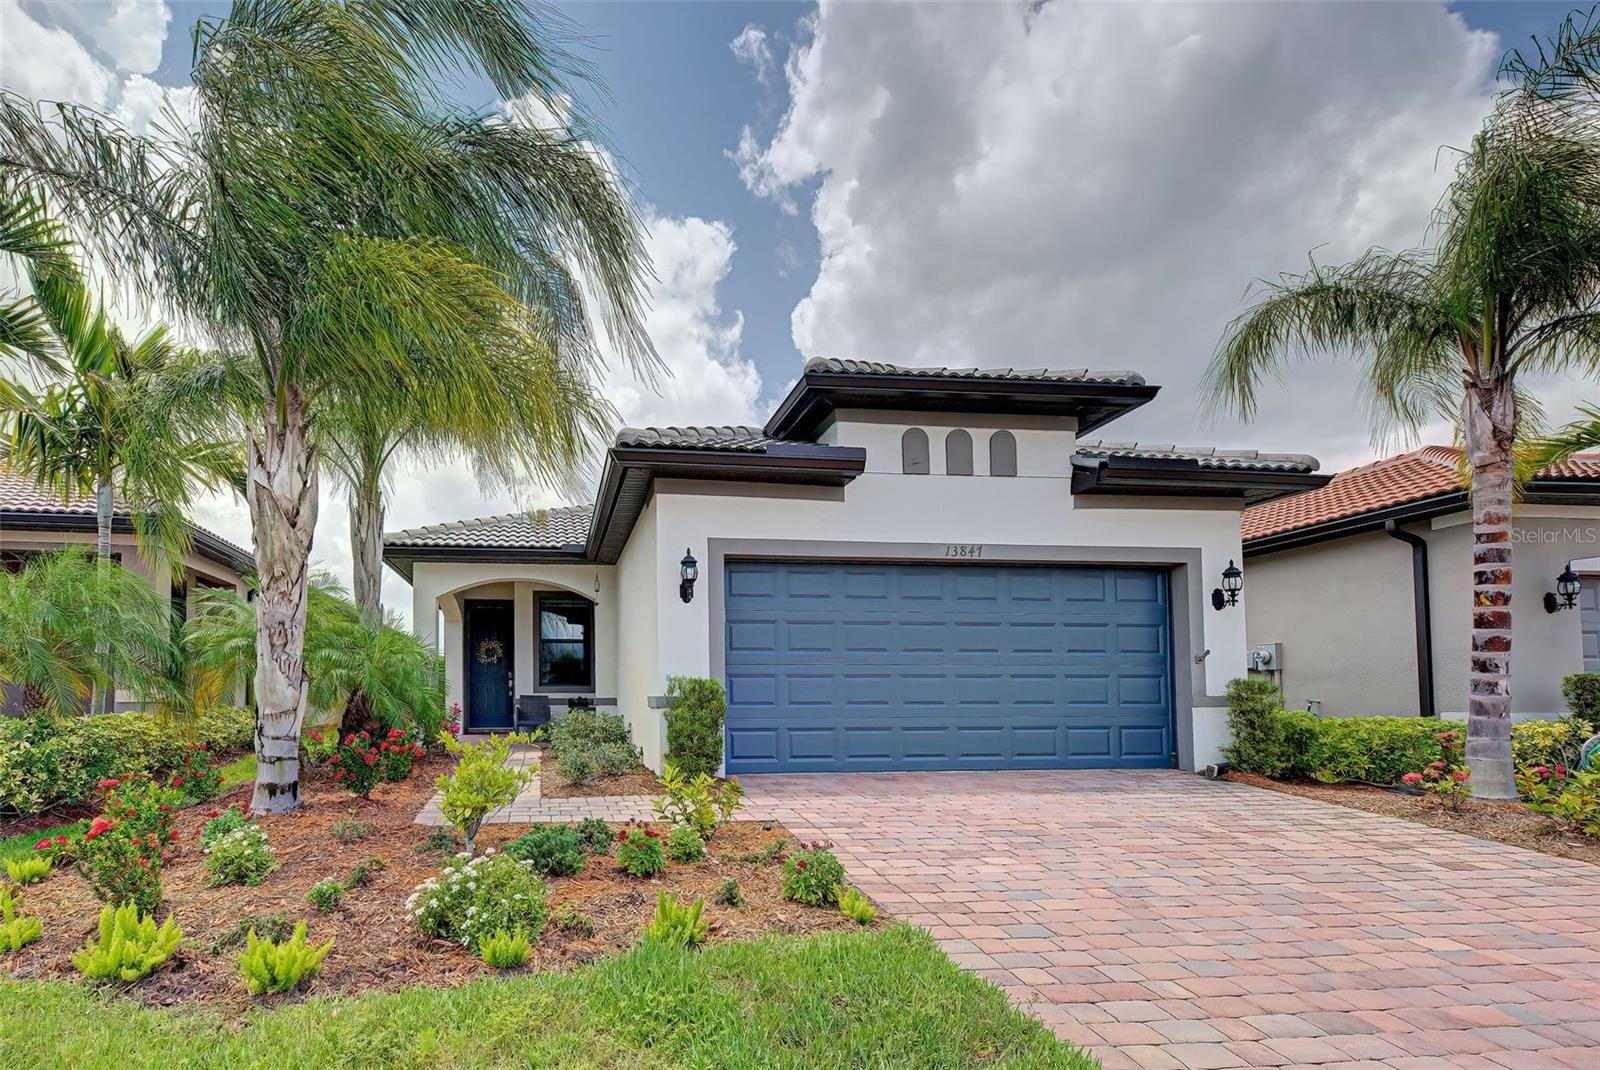 Photo for 13847 BOTTERI STREET, VENICE, FL 34293 (MLS # A4506543)